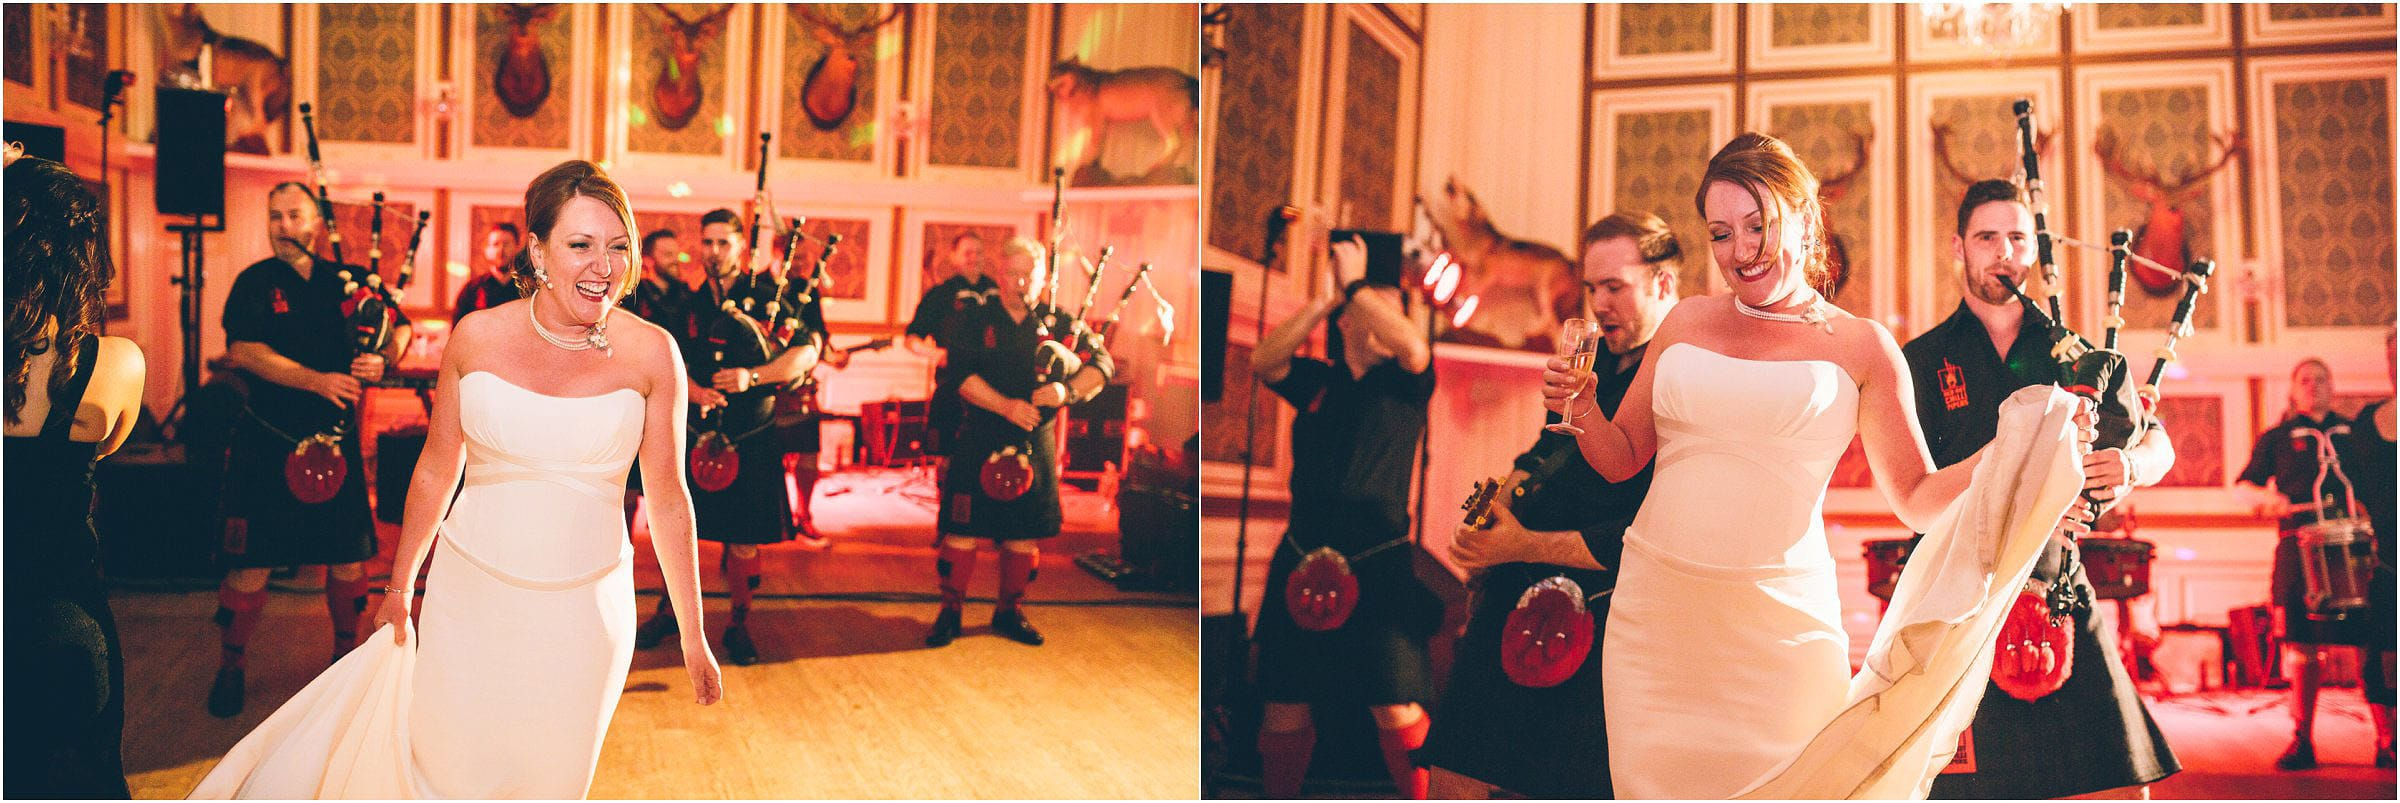 Drumtochty_Castle_Wedding_Photography_0098